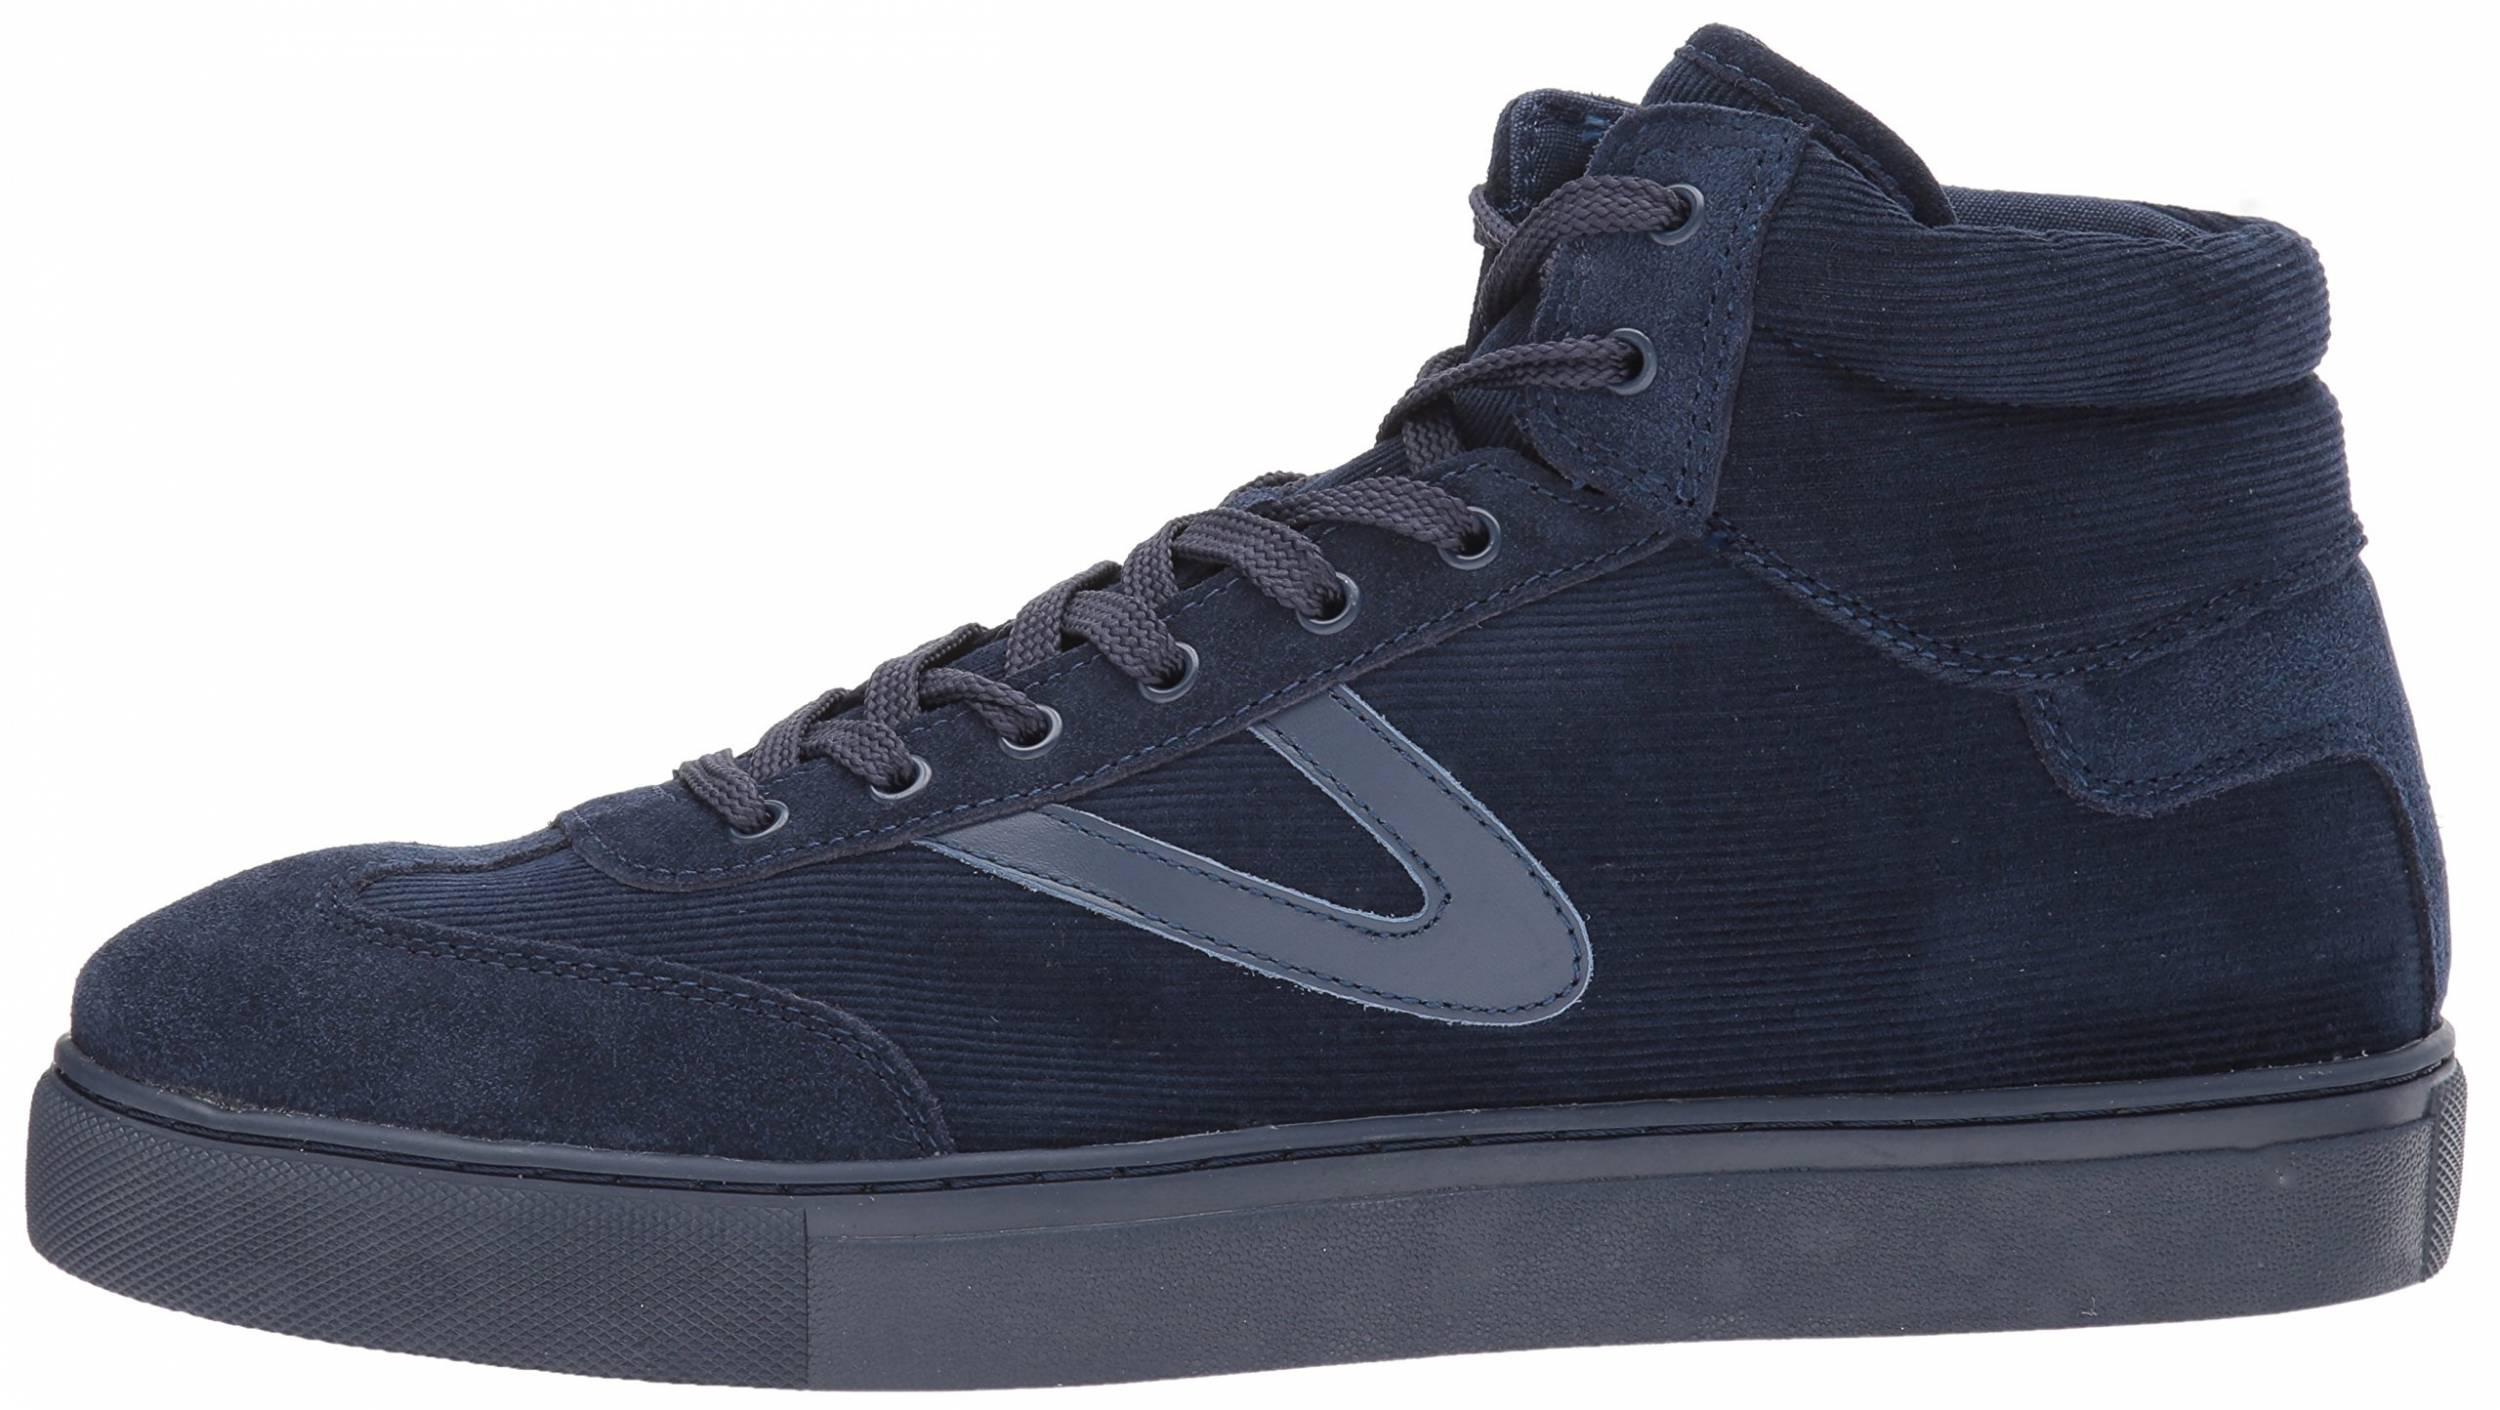 Save 31% on Tretorn Sneakers (13 Models